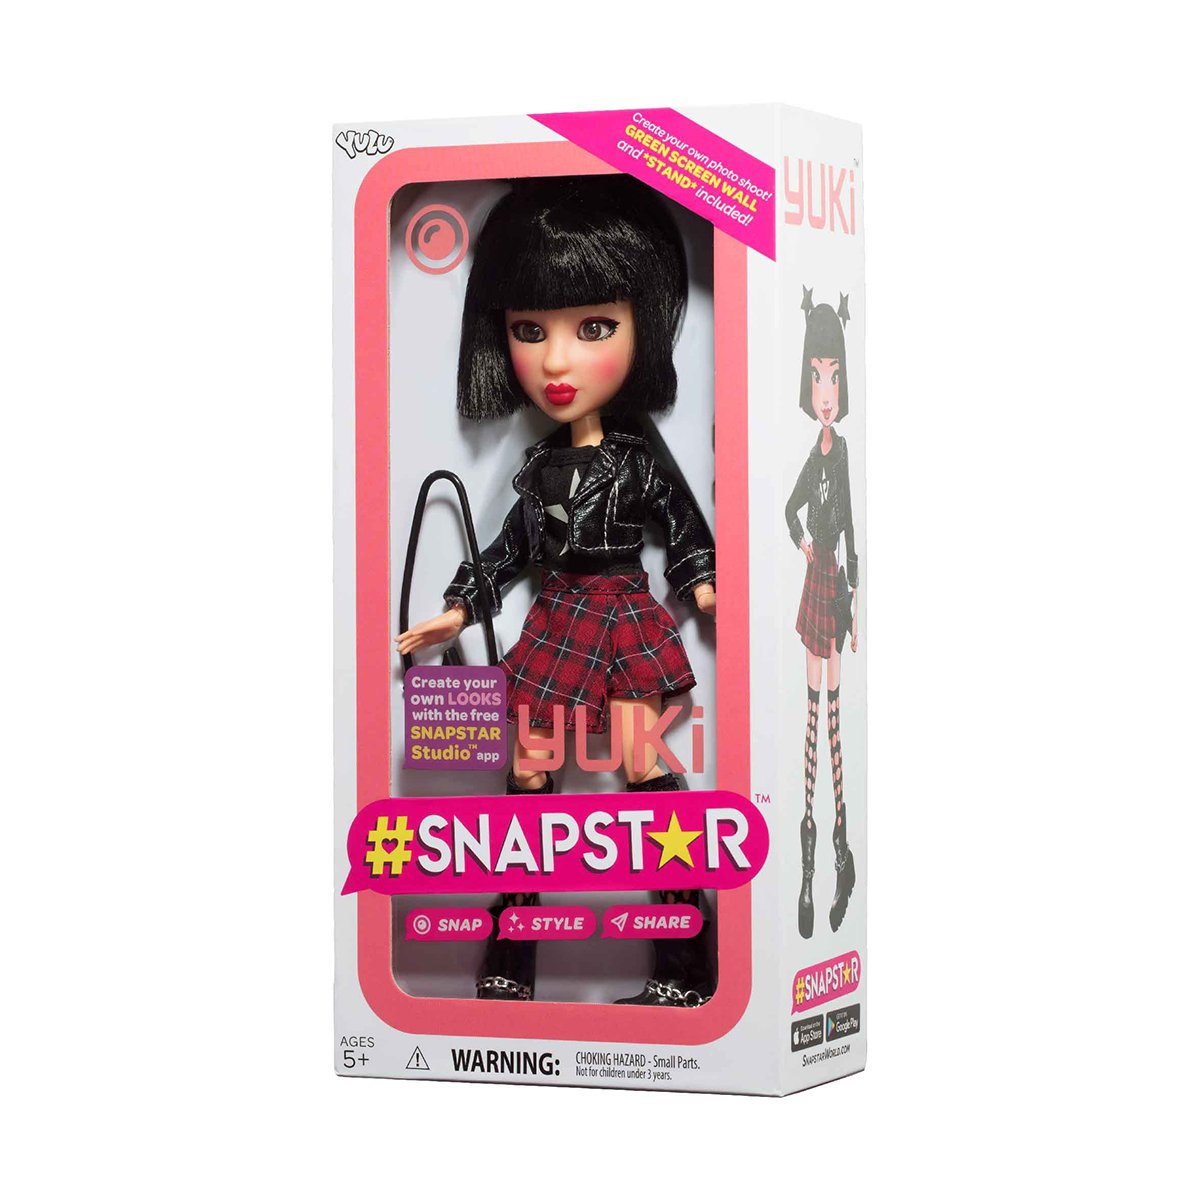 Papusa SnapStar, Yuki